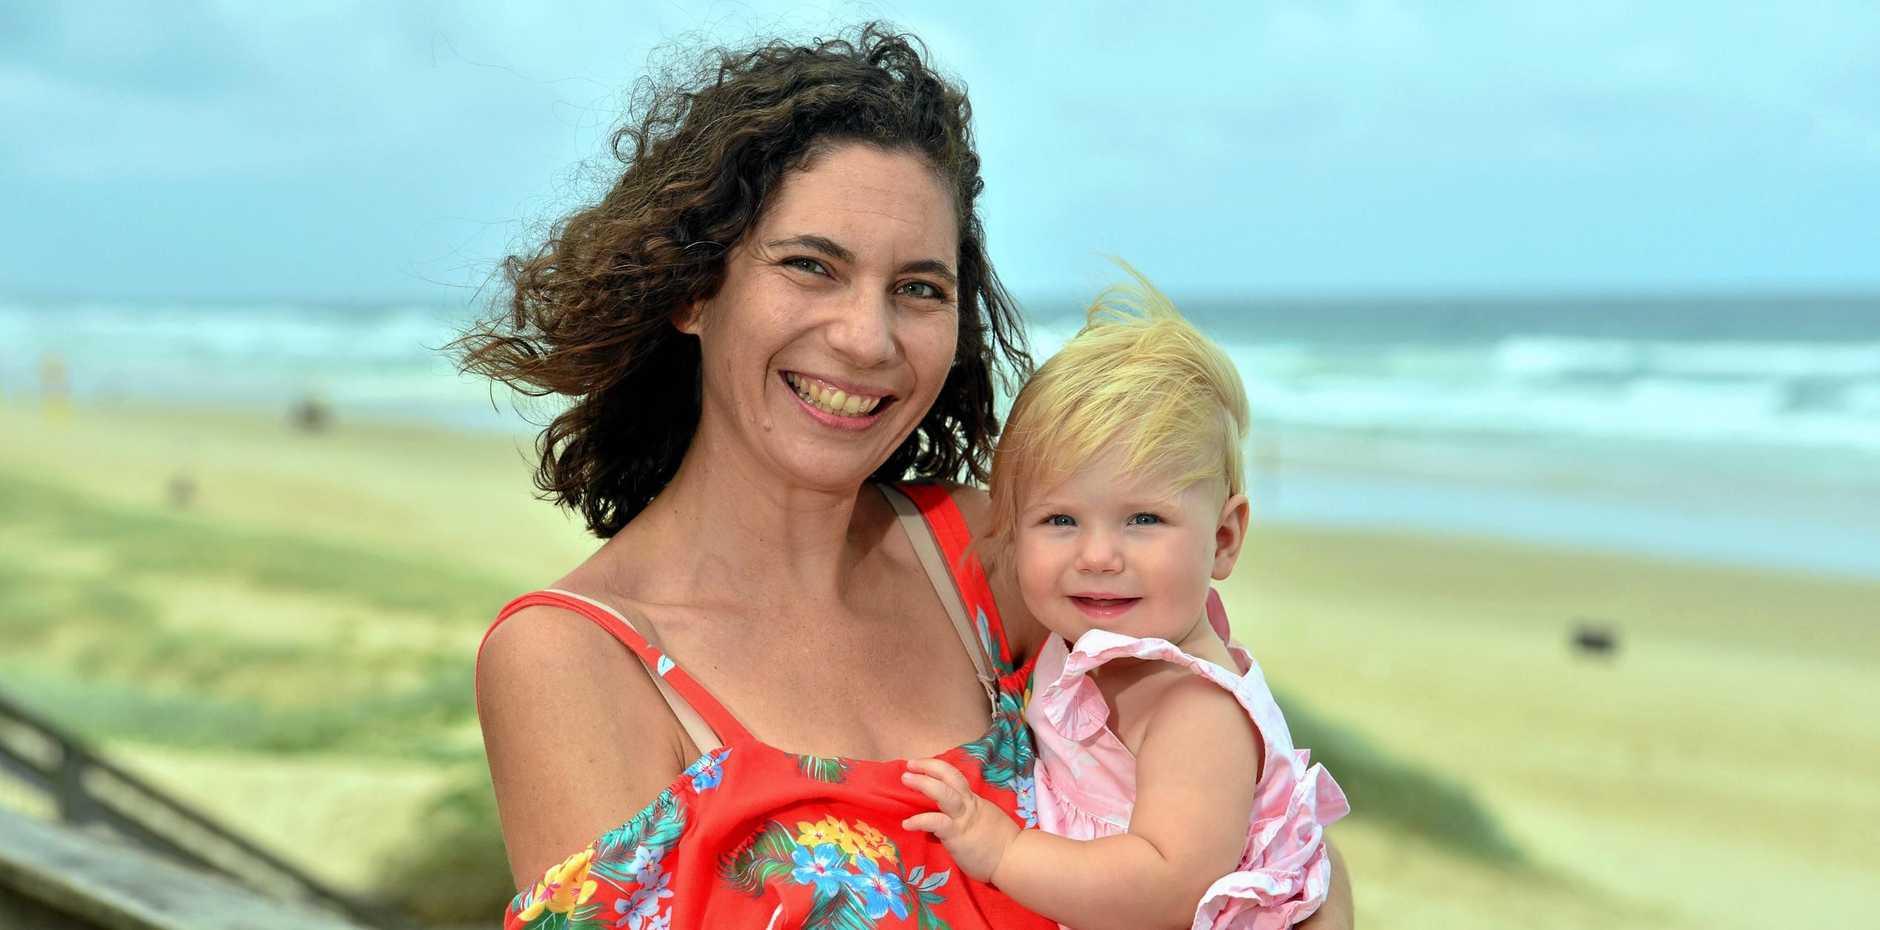 Letea Cavander with her daughter Tallulah Stuart at Coolum Beach.